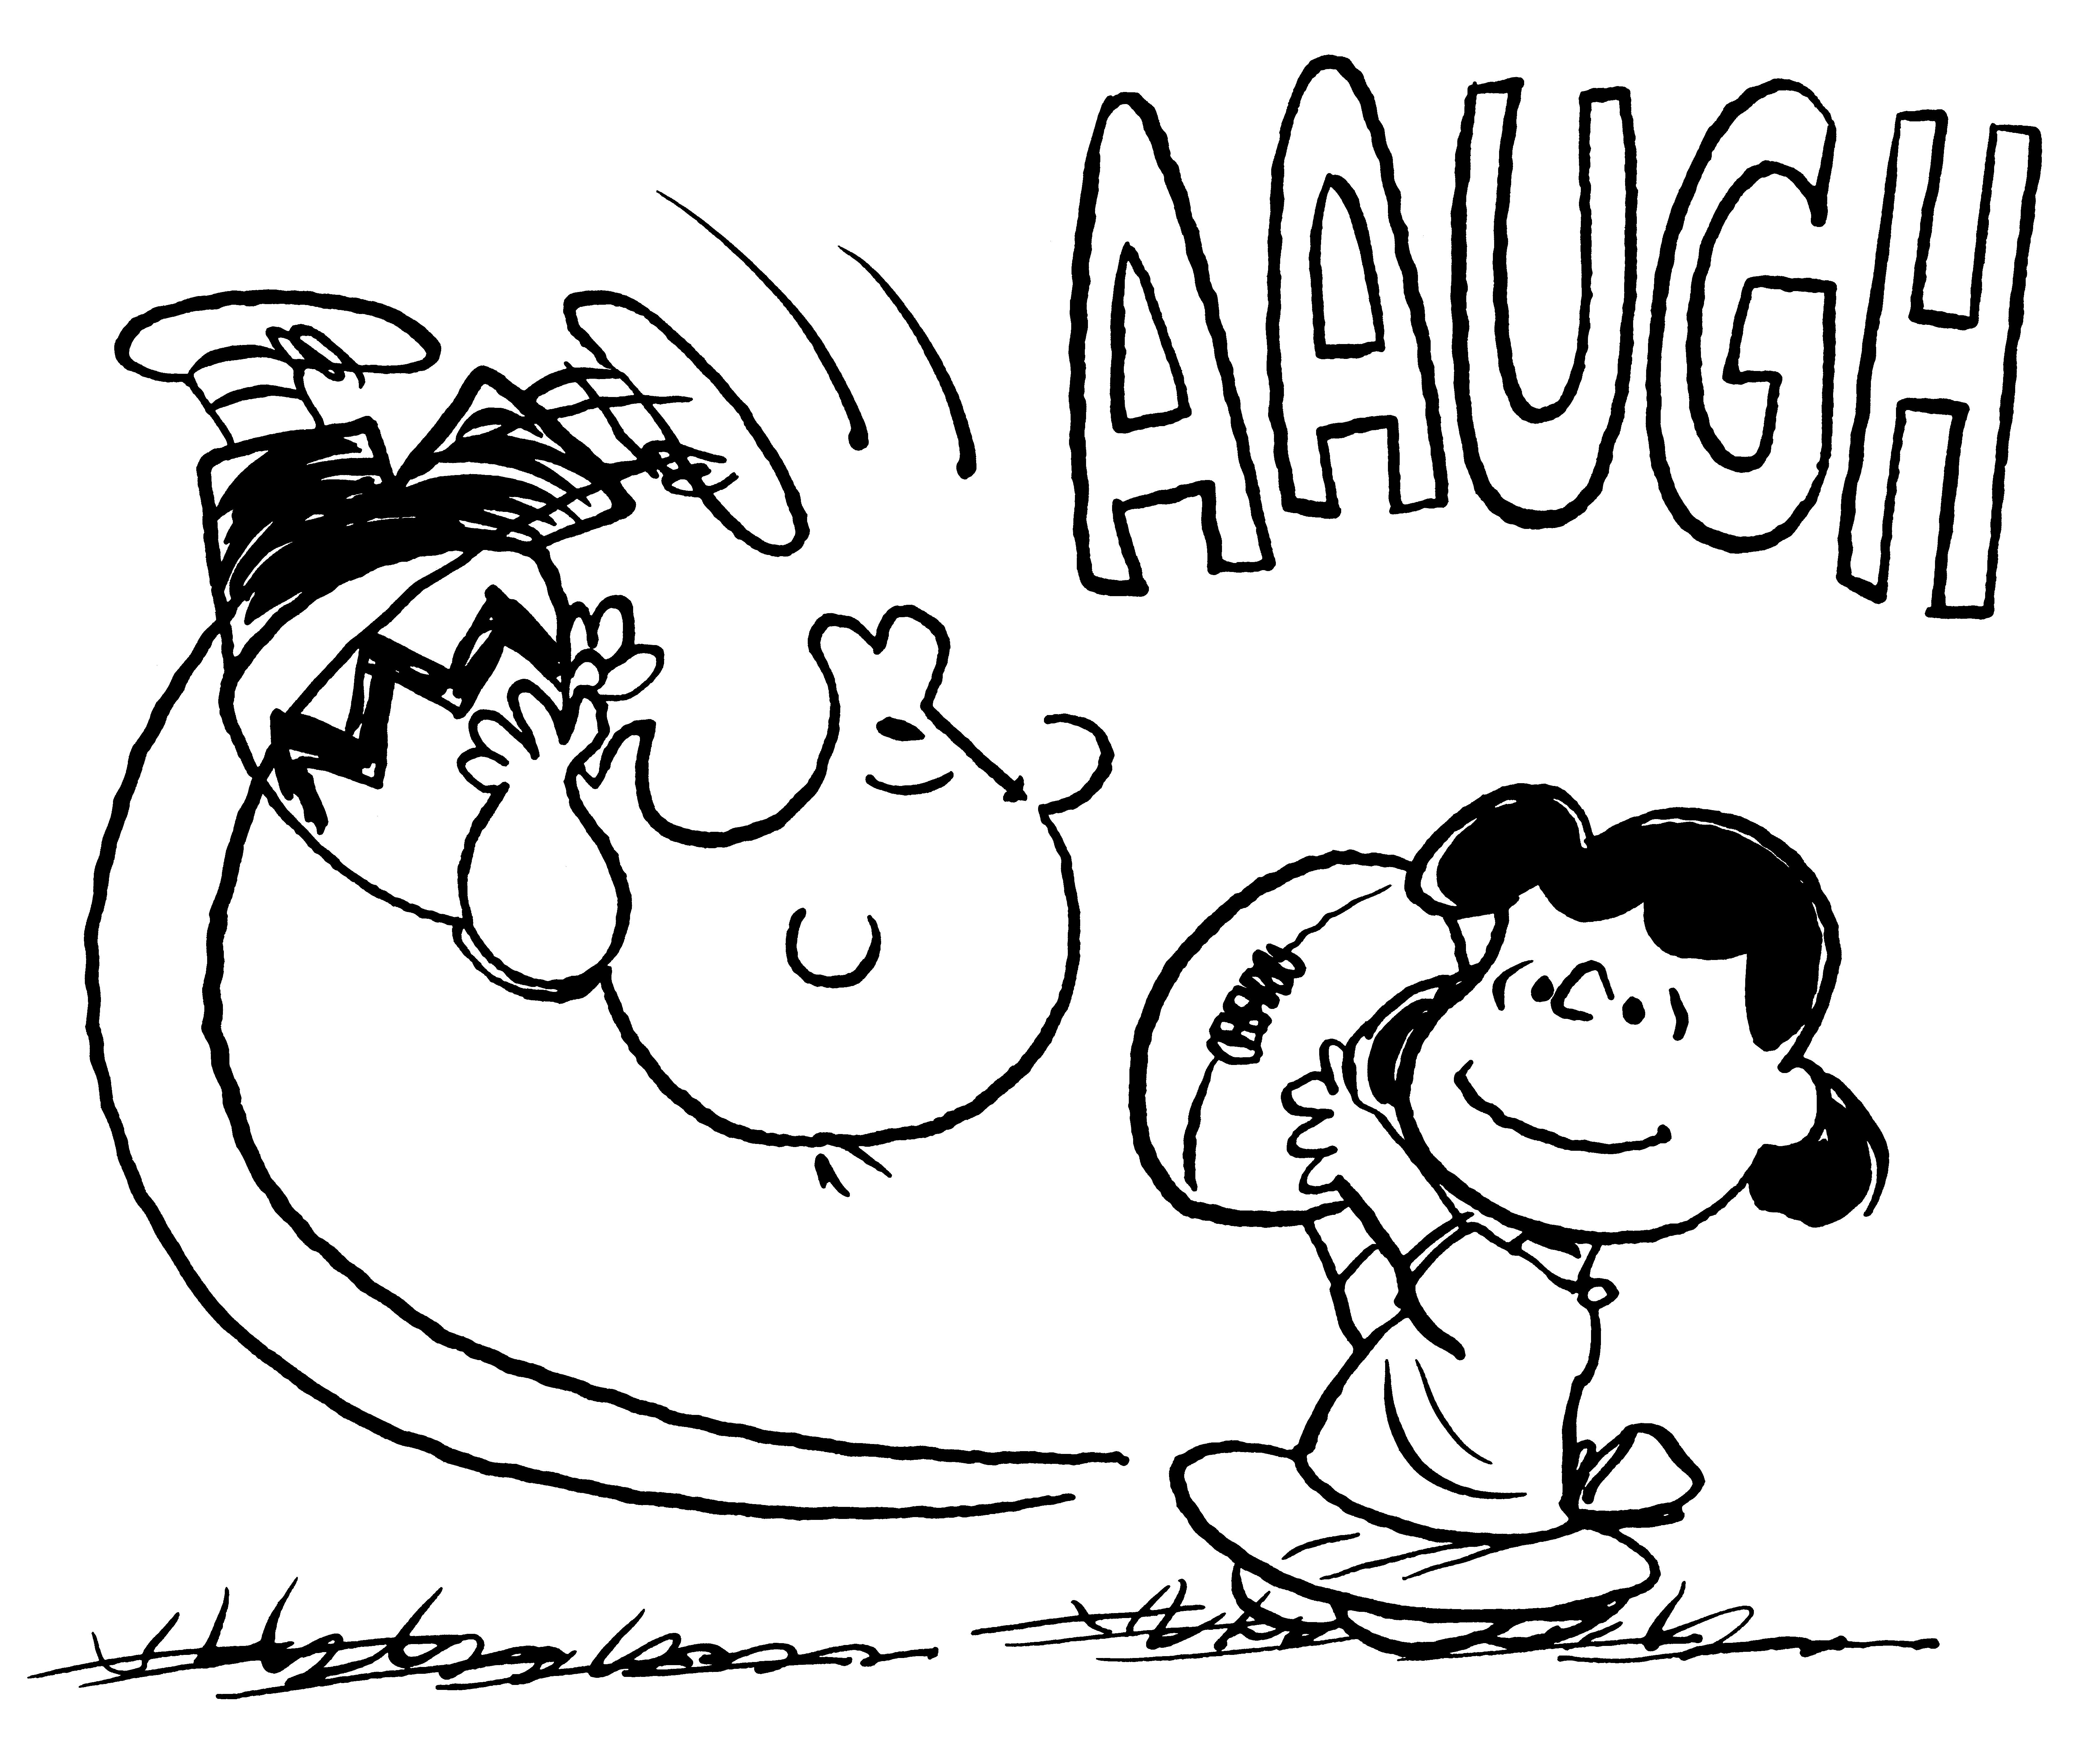 12 Themes That Make Peanuts Timeless - Threadless Blog